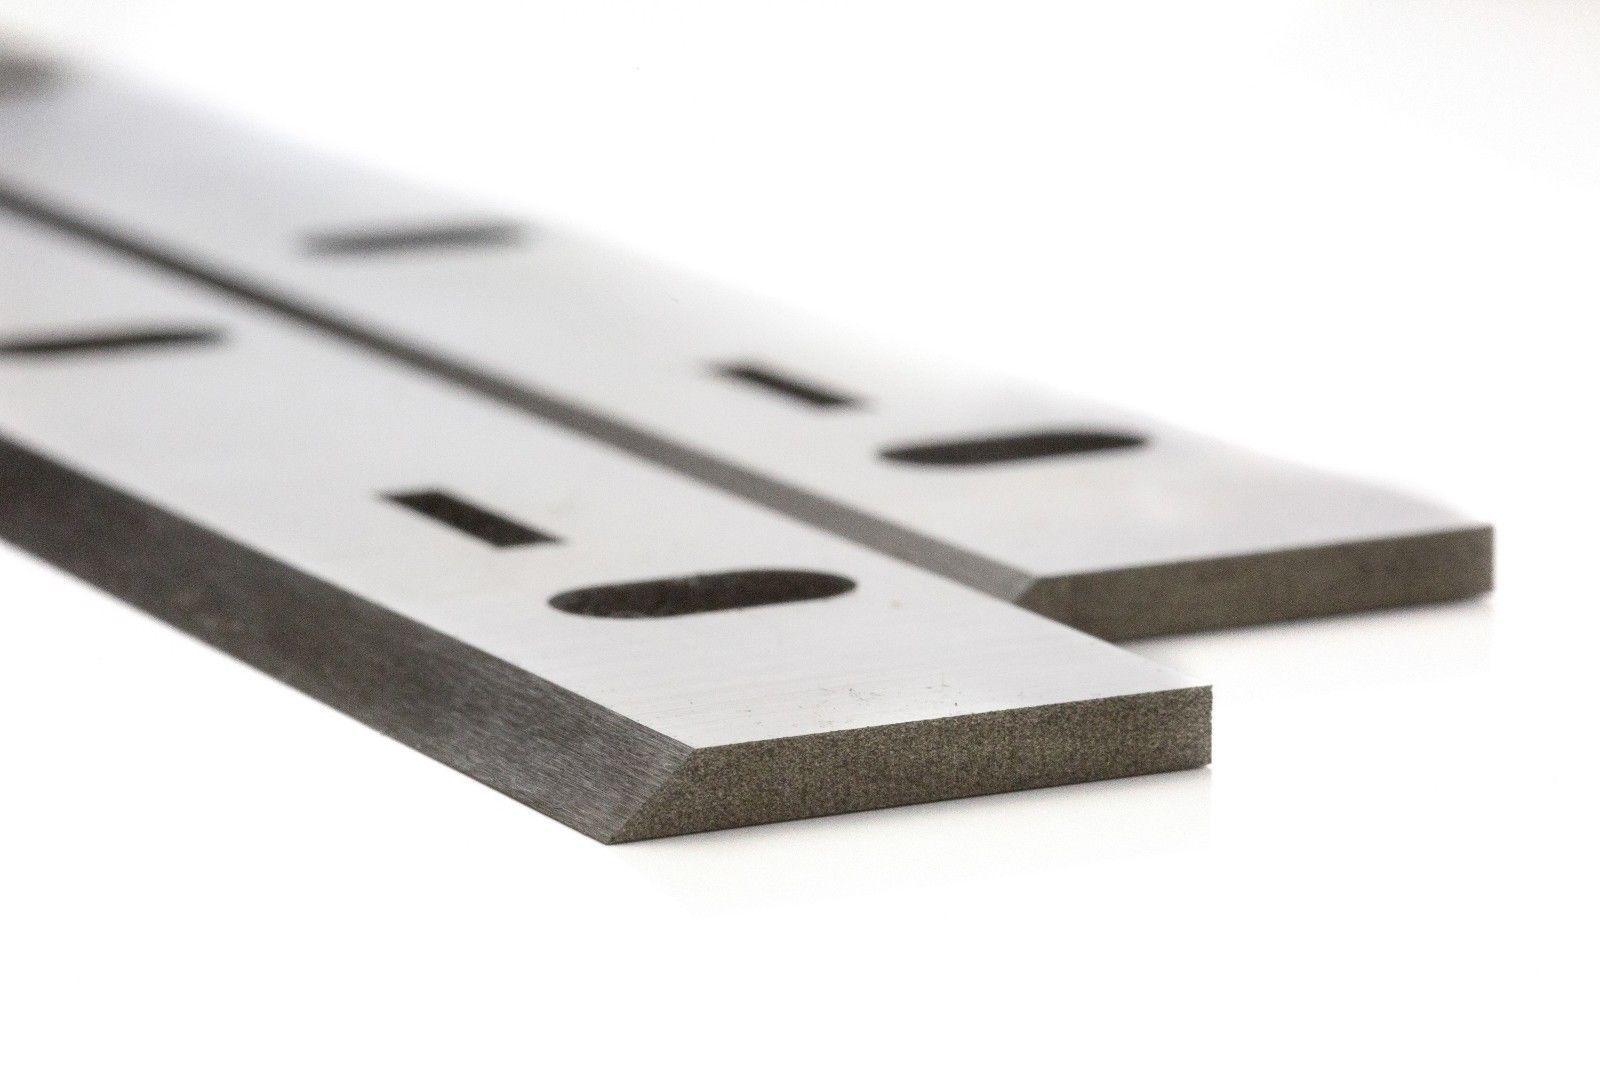 1000 Stück Blindnieten 4x14 Alu//Stahl FK 4 x 14 Standard  ///_xx